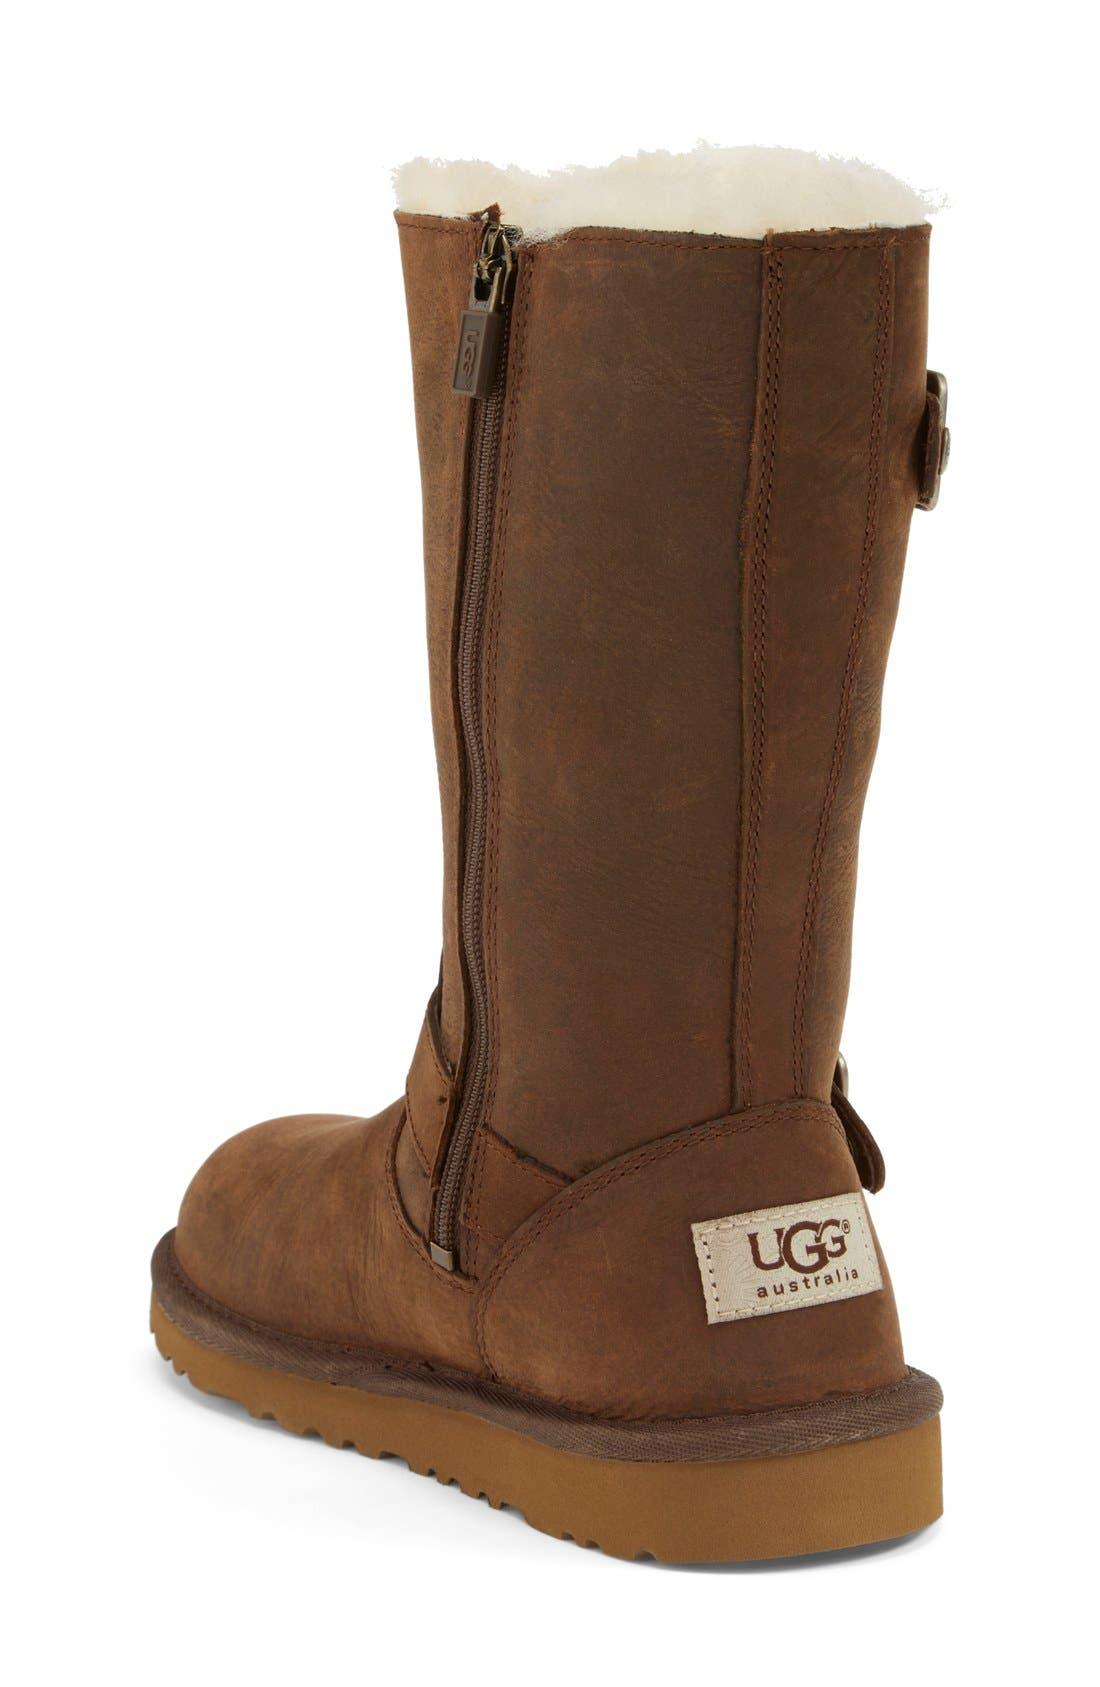 Alternate Image 2  - UGG® 'Kensington' Boot (Toddler, Little Kid & Big Kid)